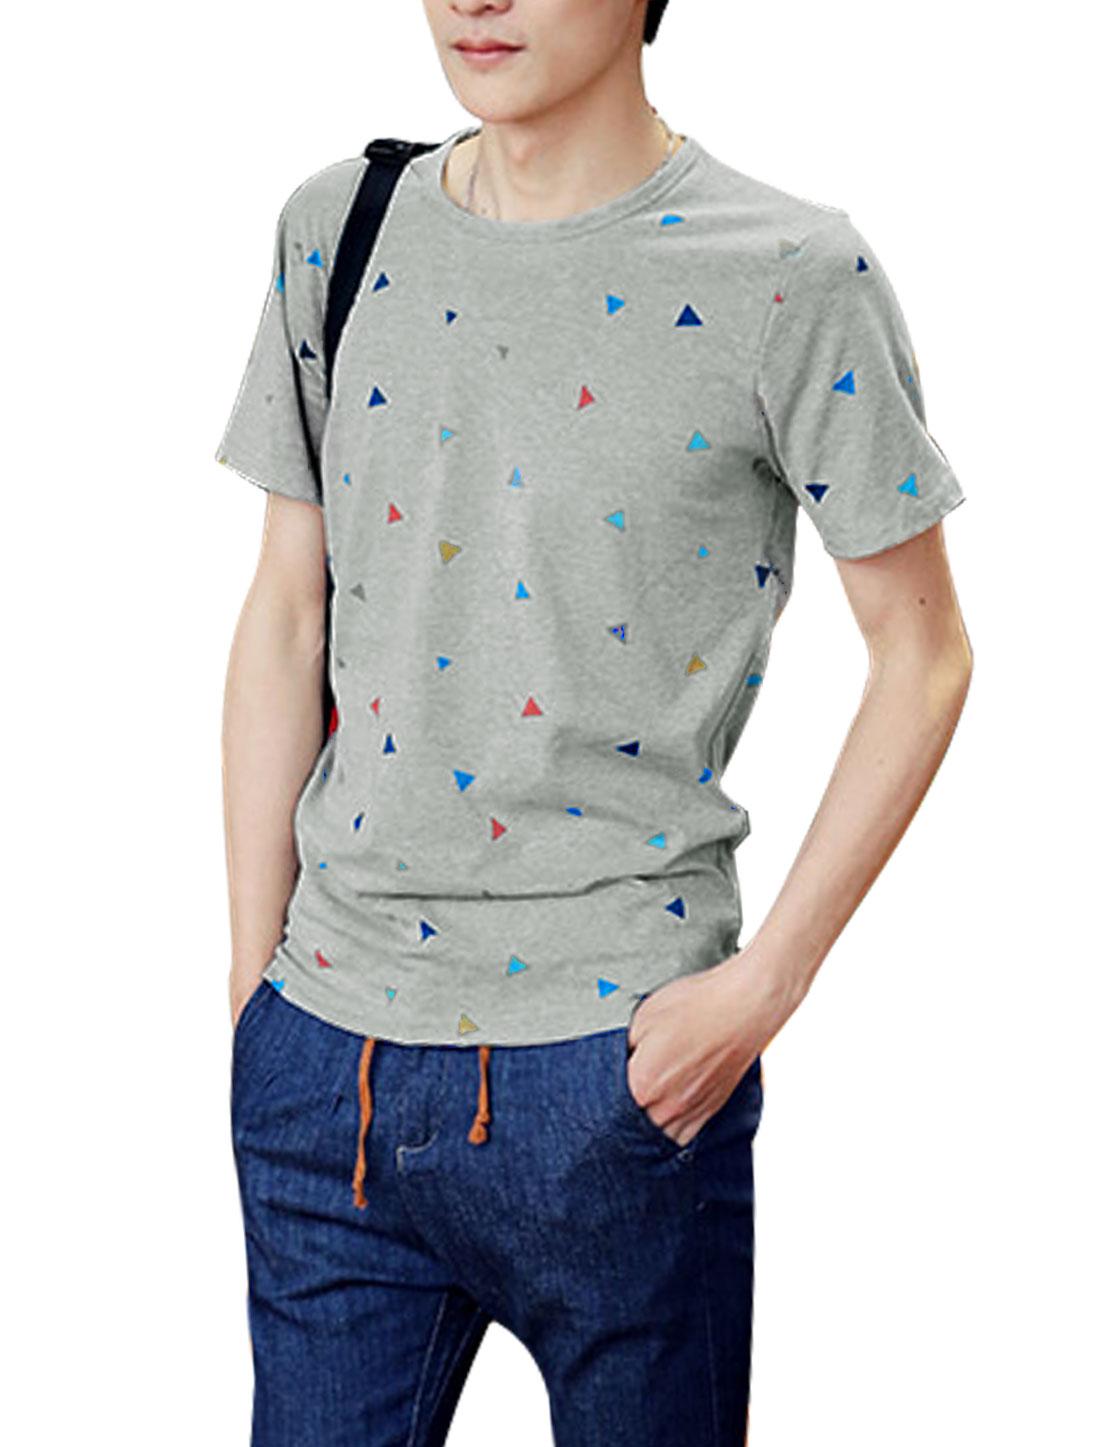 Men Round Neck Short Sleeve Triangle Prints Slipover Tee Light Gray S